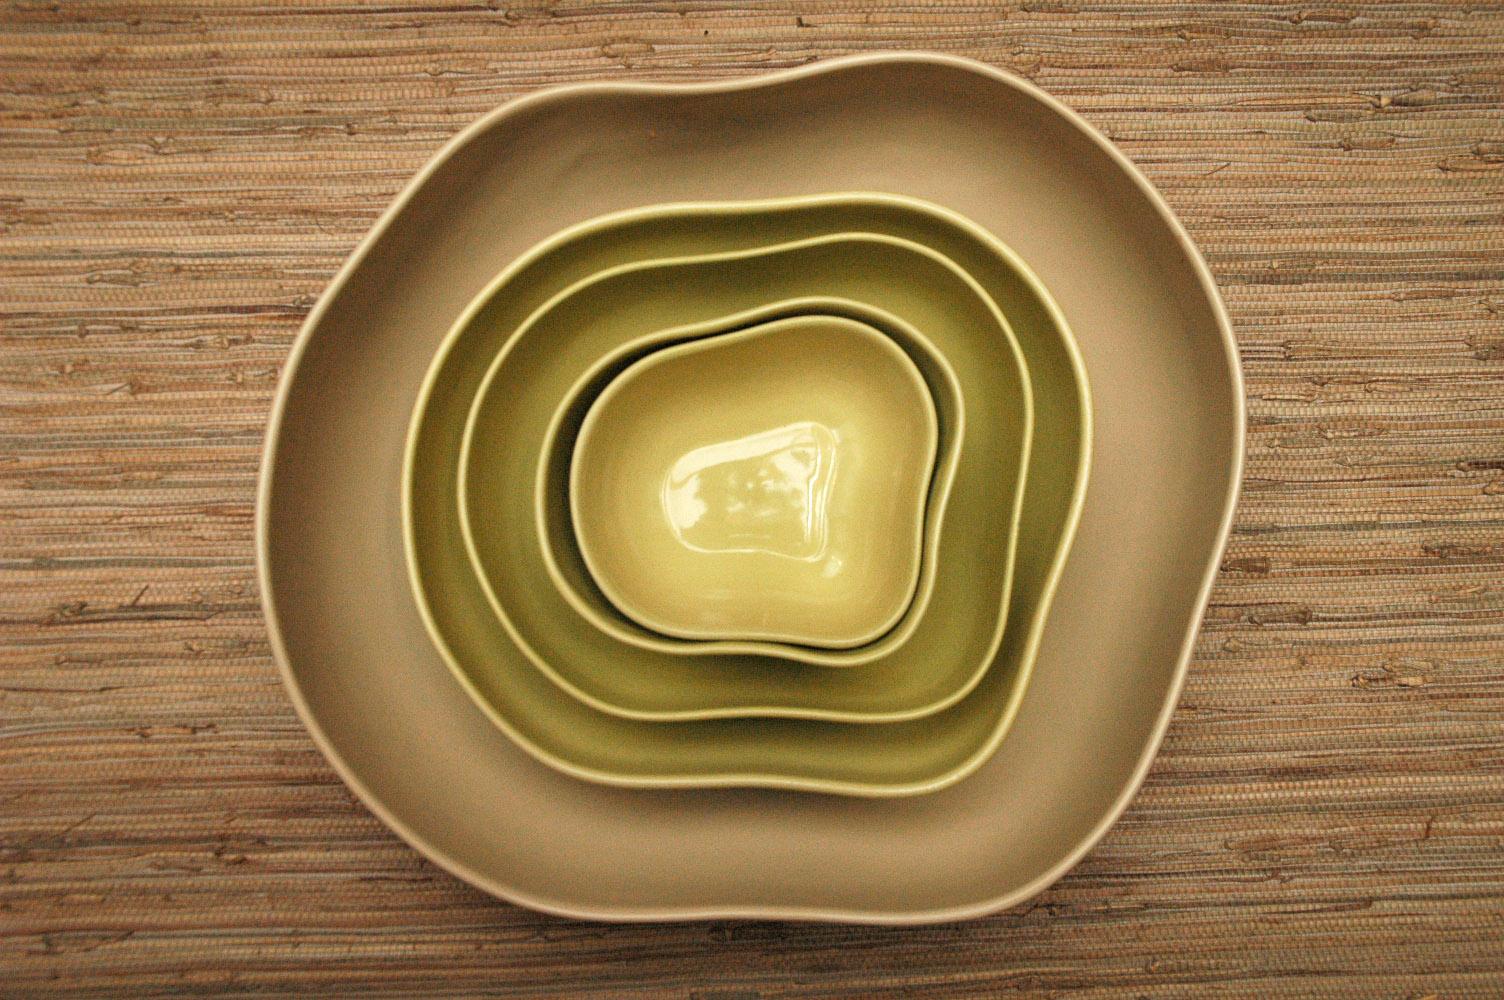 Tamac bowl stack